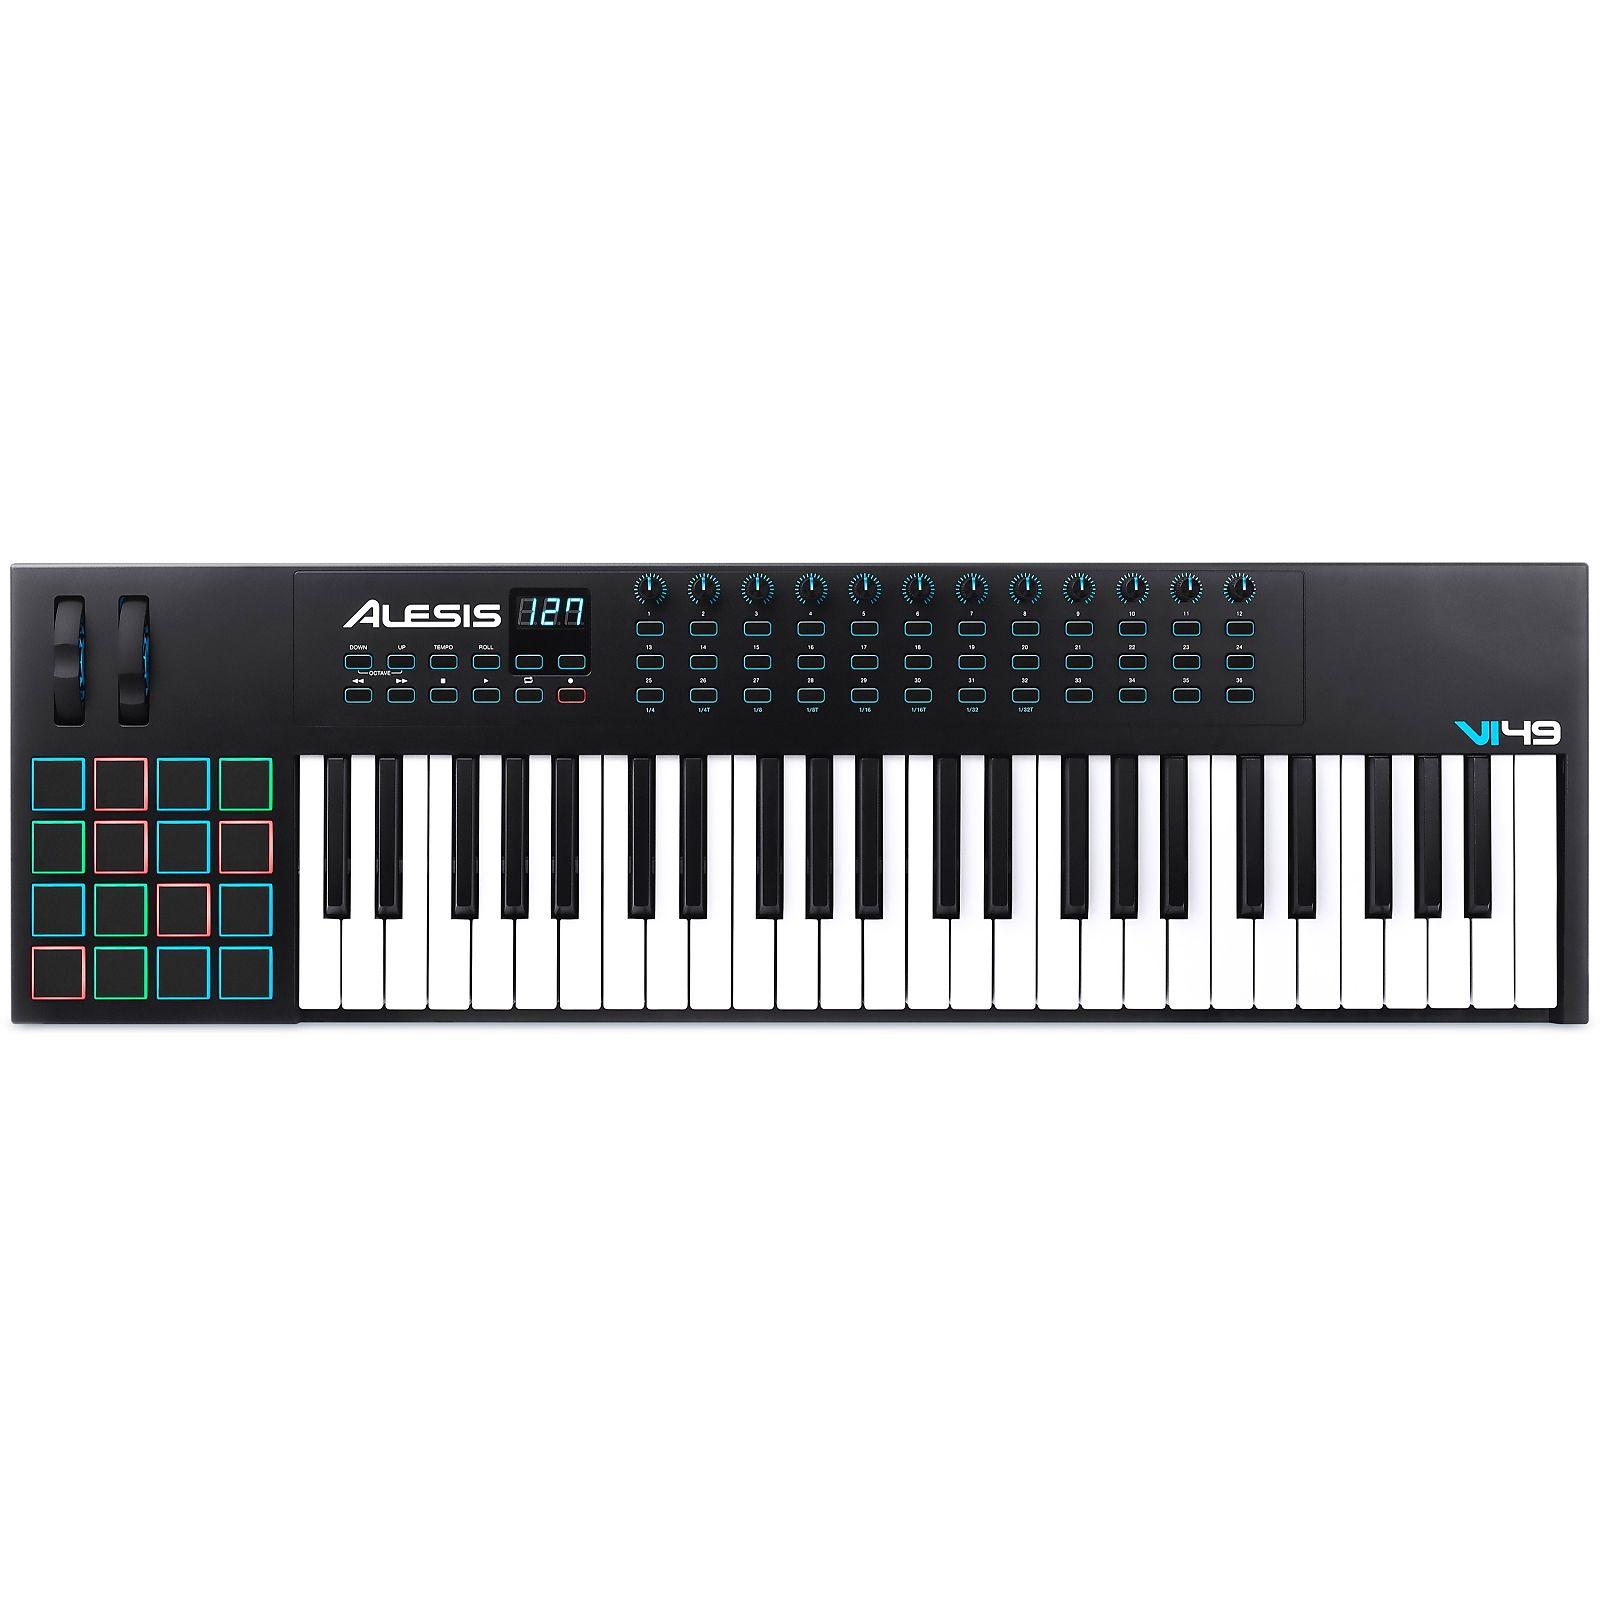 Alesis VI49 USB MIDI Controller Keyboard